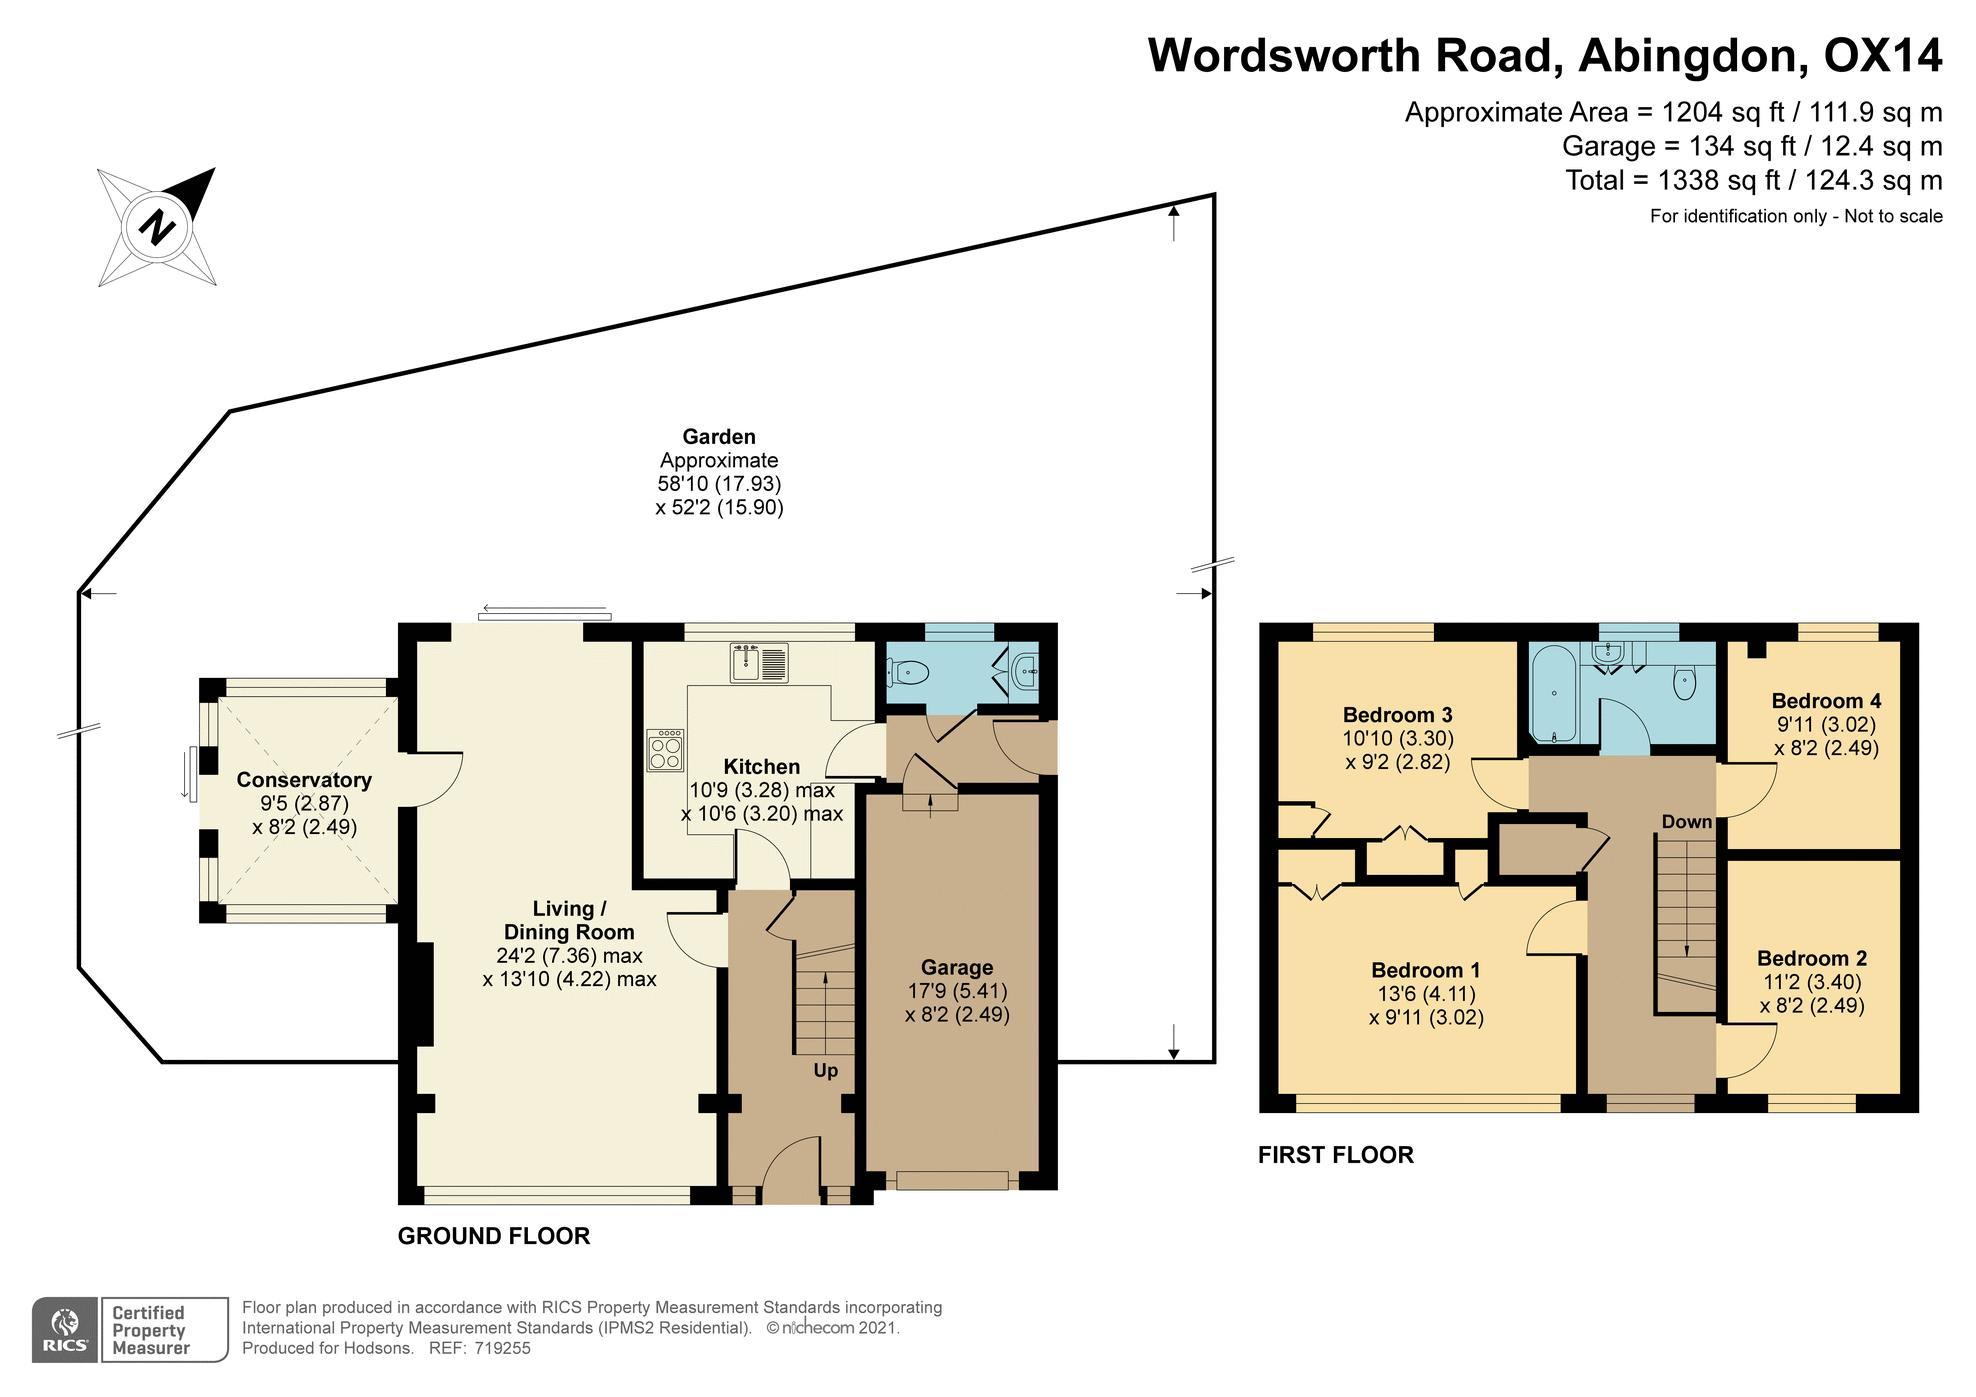 Wordsworth Road